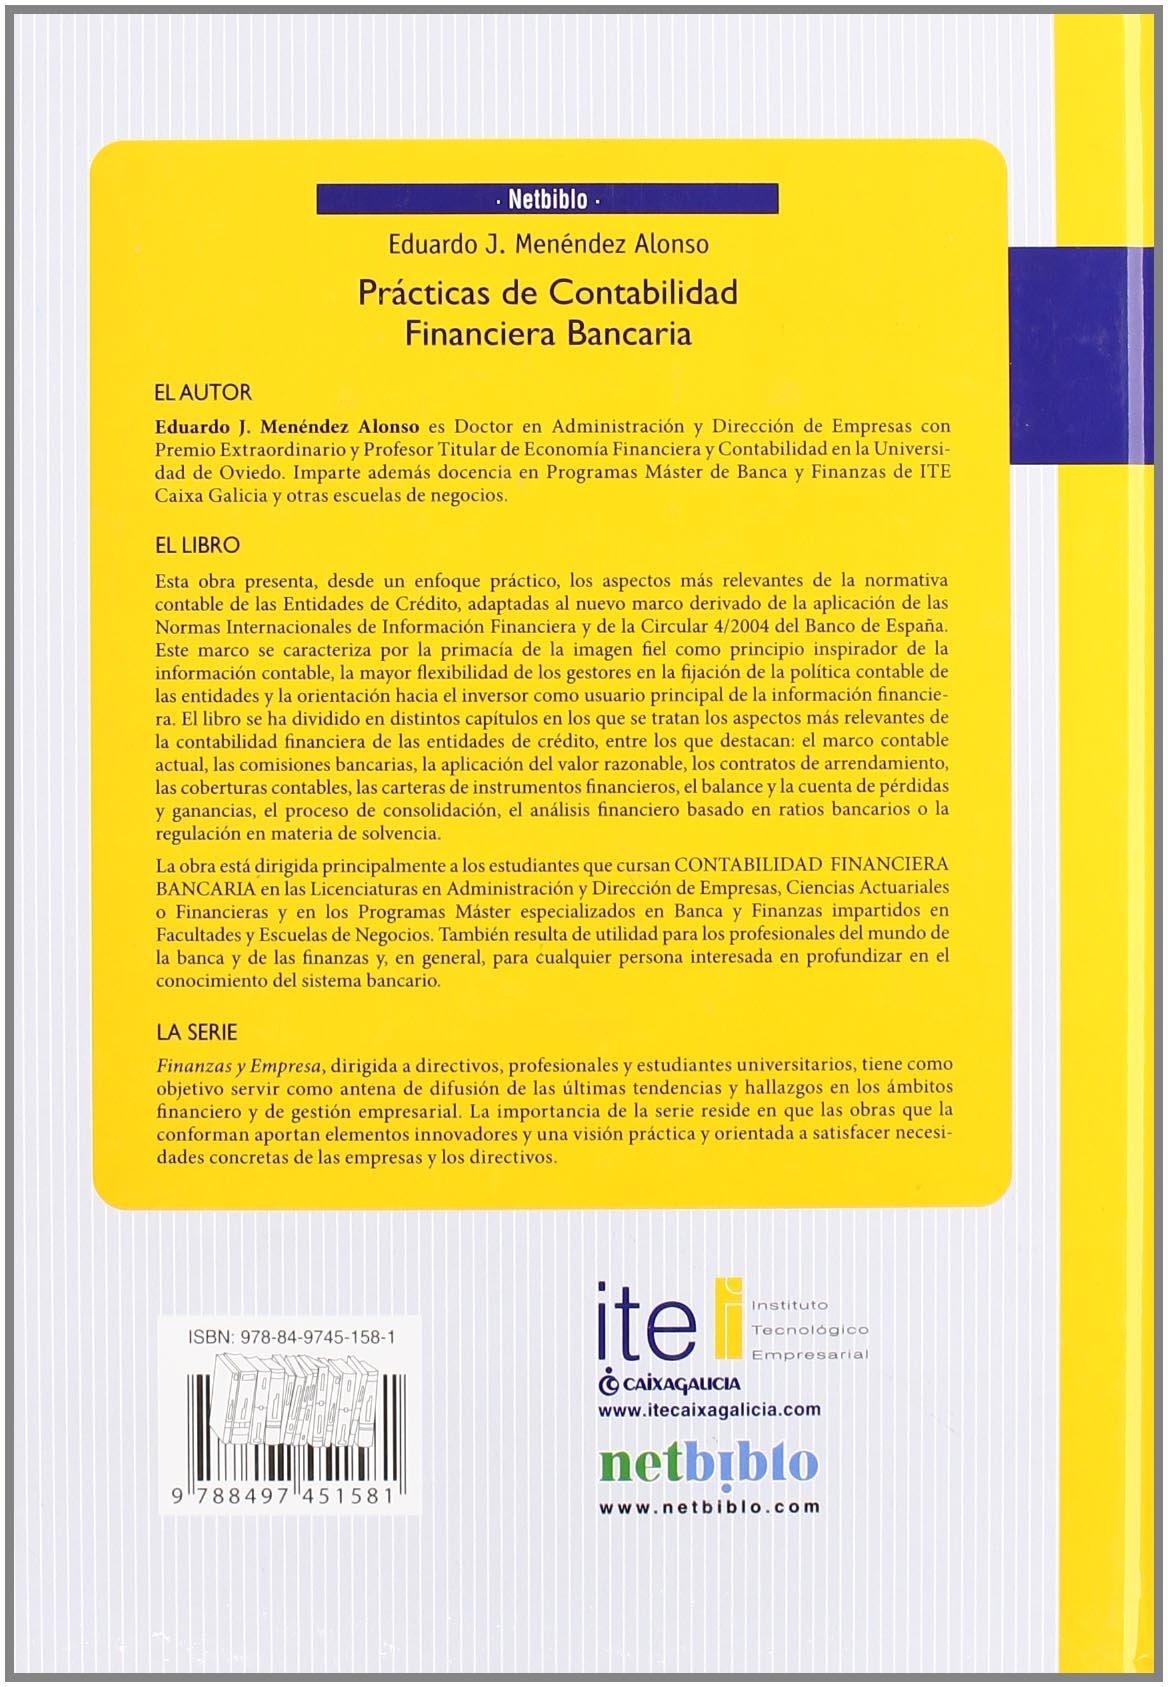 Prácticas de Contabilidad Financiera Bancaria (Spanish Edition): Eduardo Menendez Alonso: 9788497451581: Amazon.com: Books